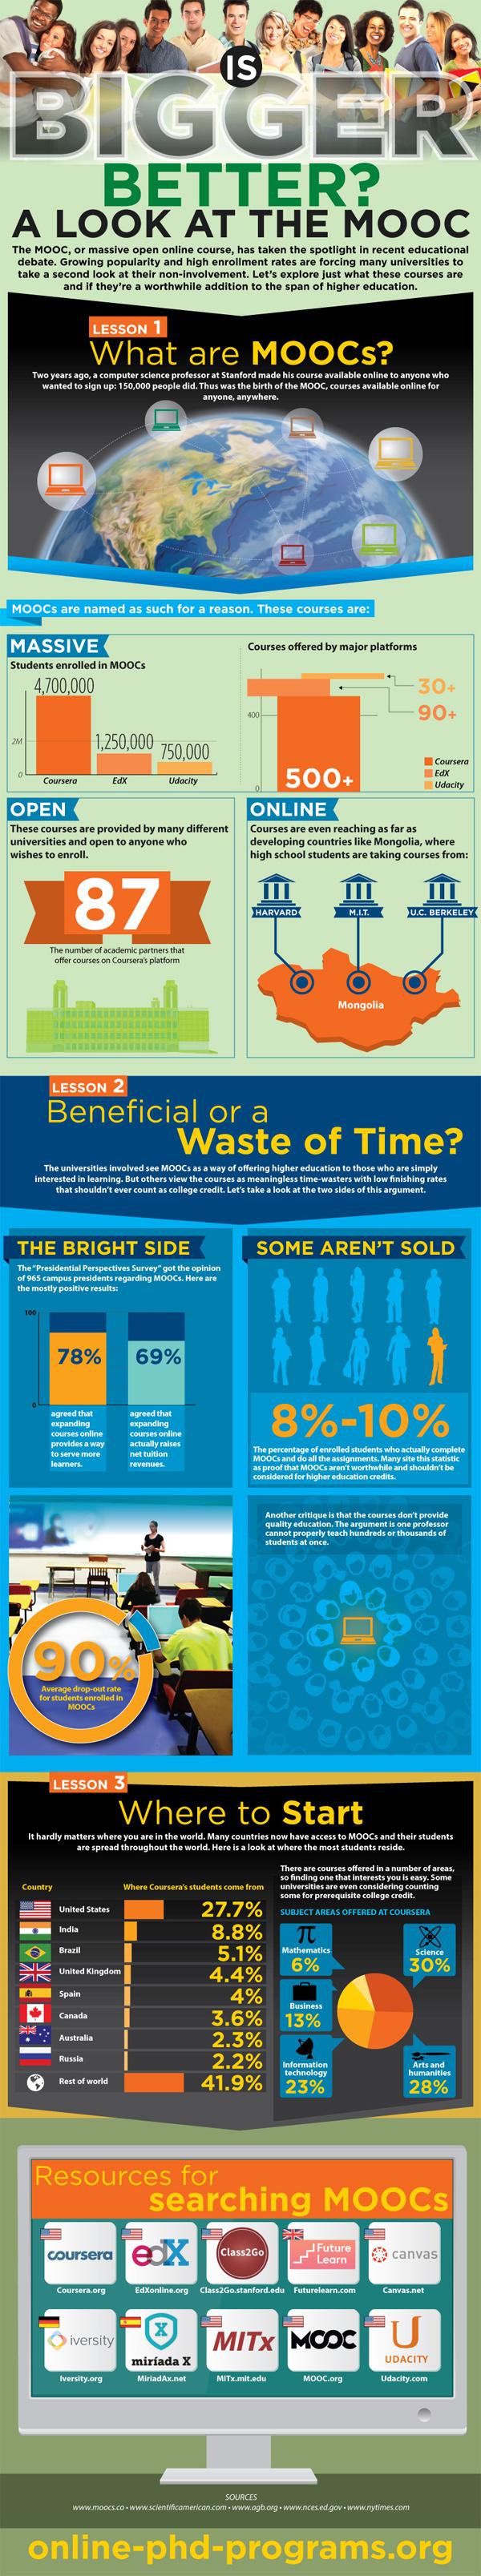 Higher Education Moocs 101-Infographic